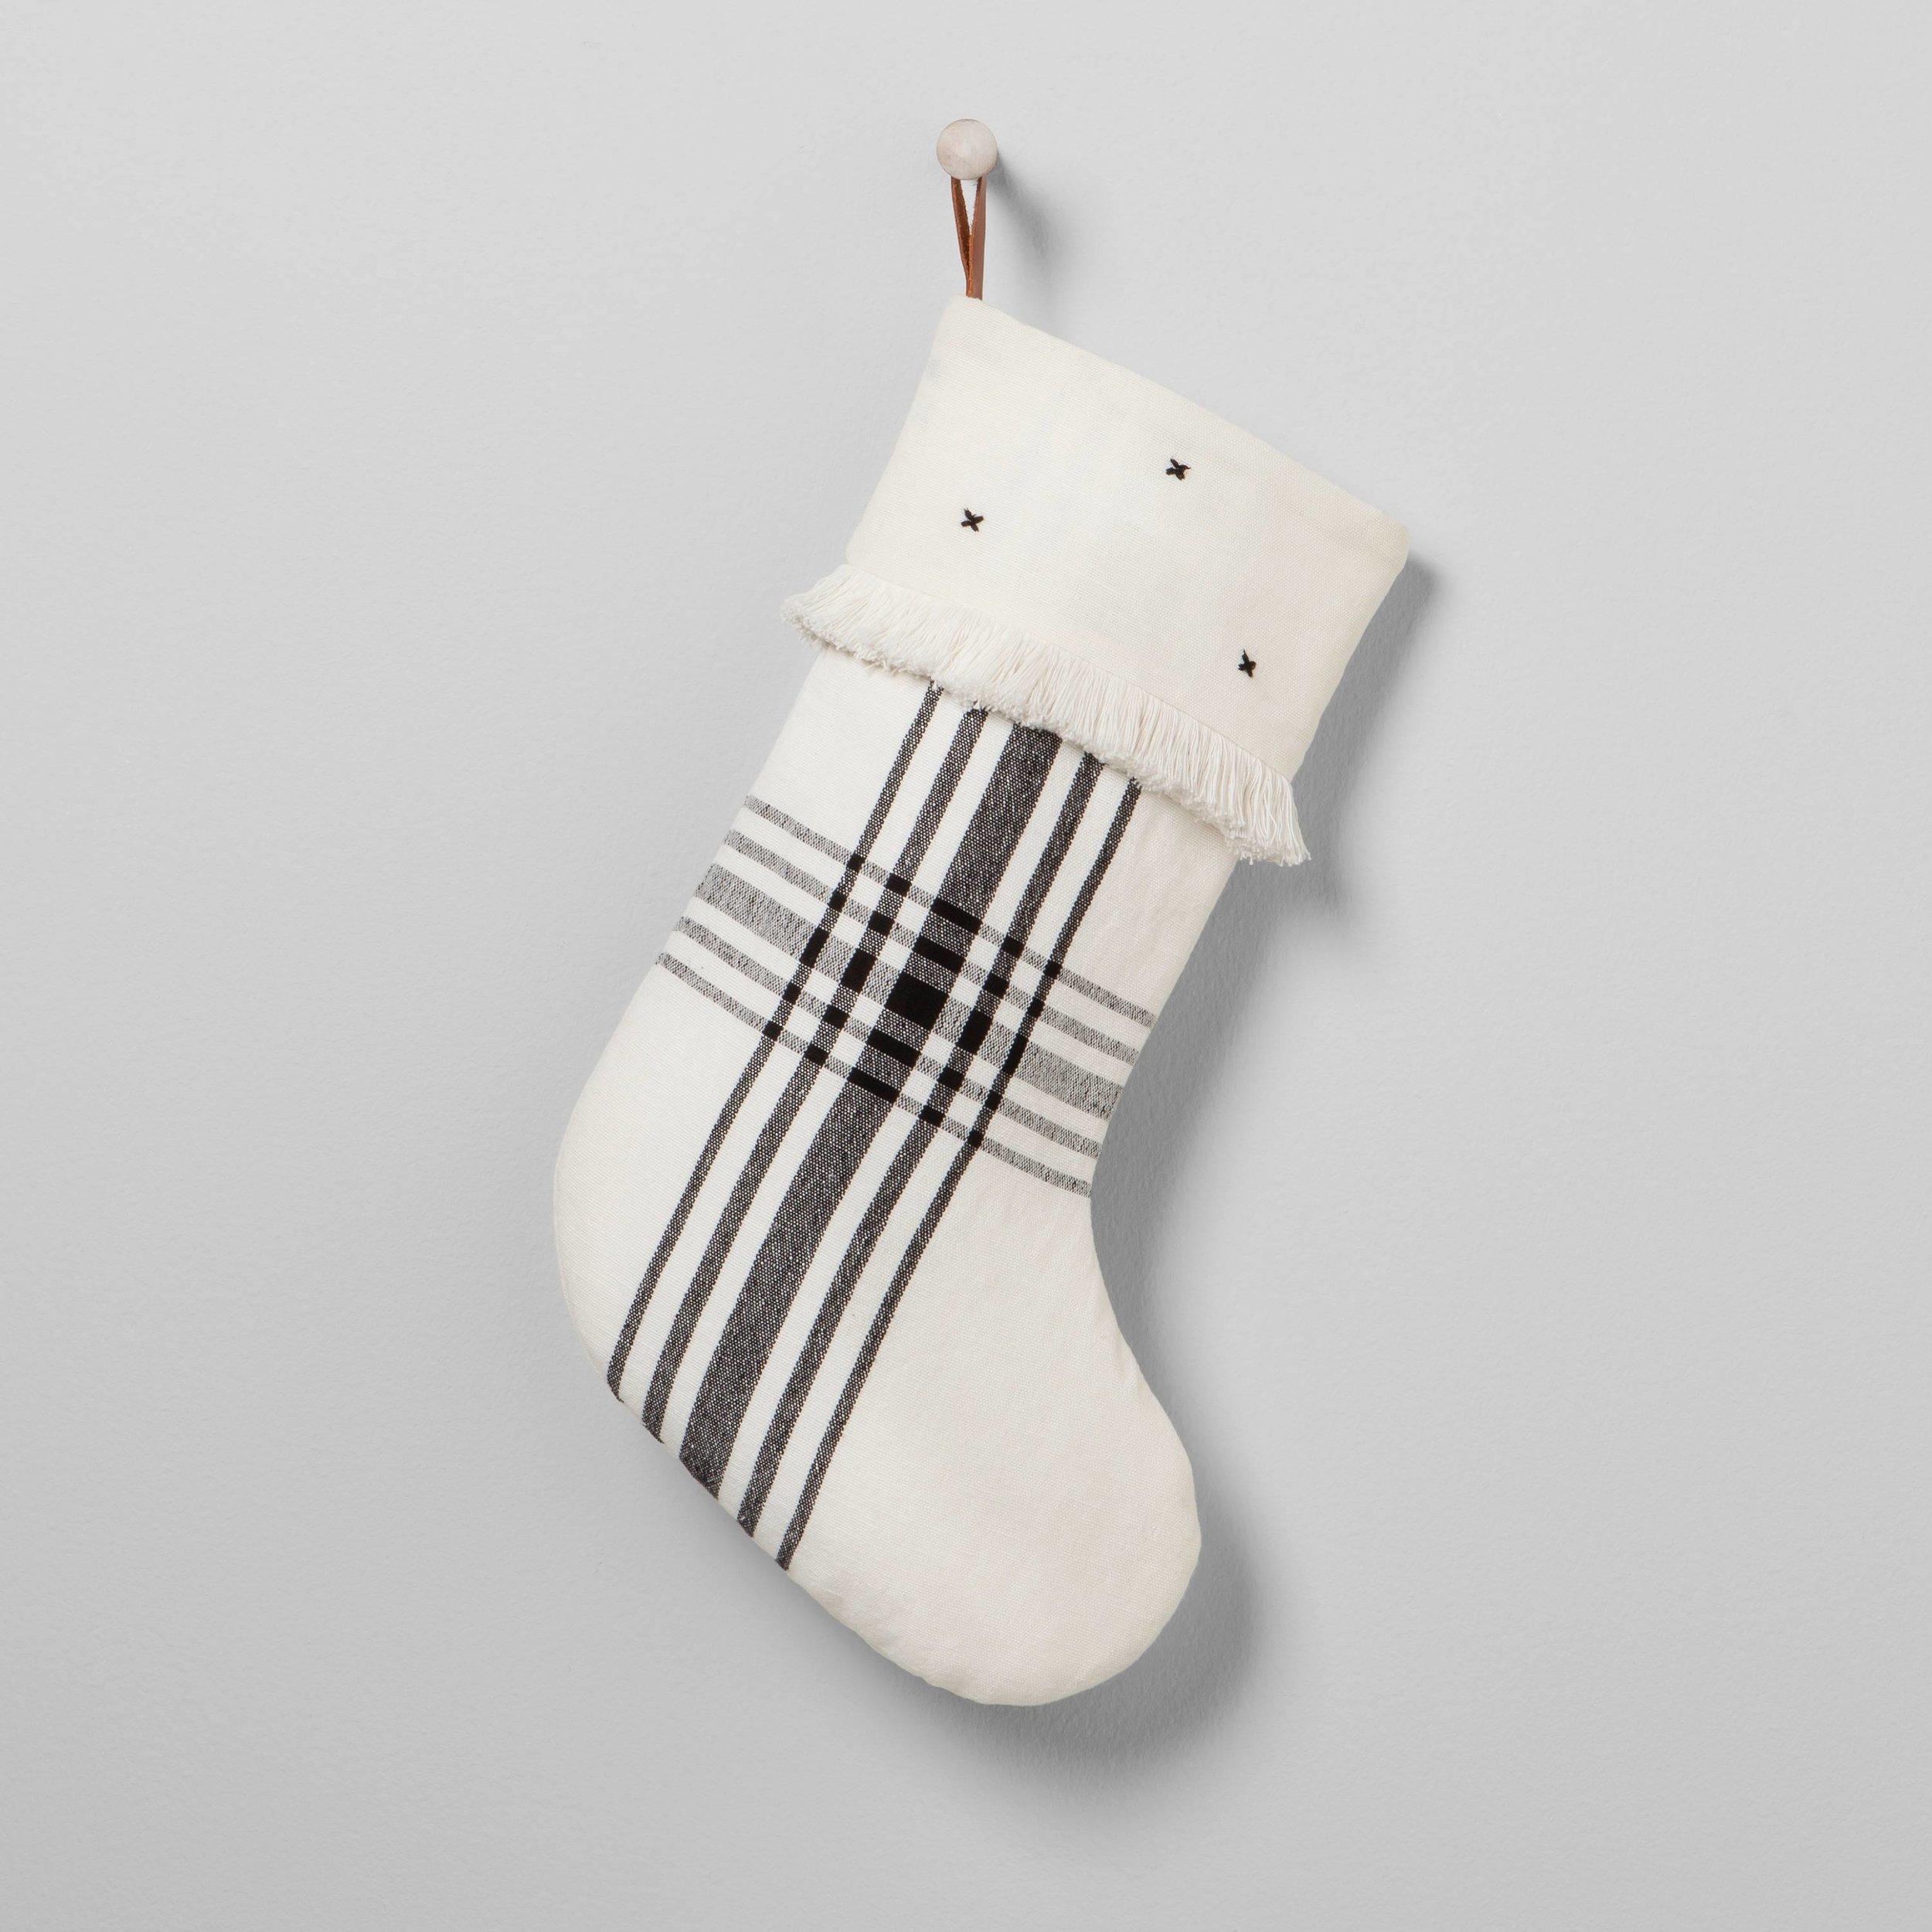 hh plaid cream stocking x.jpg